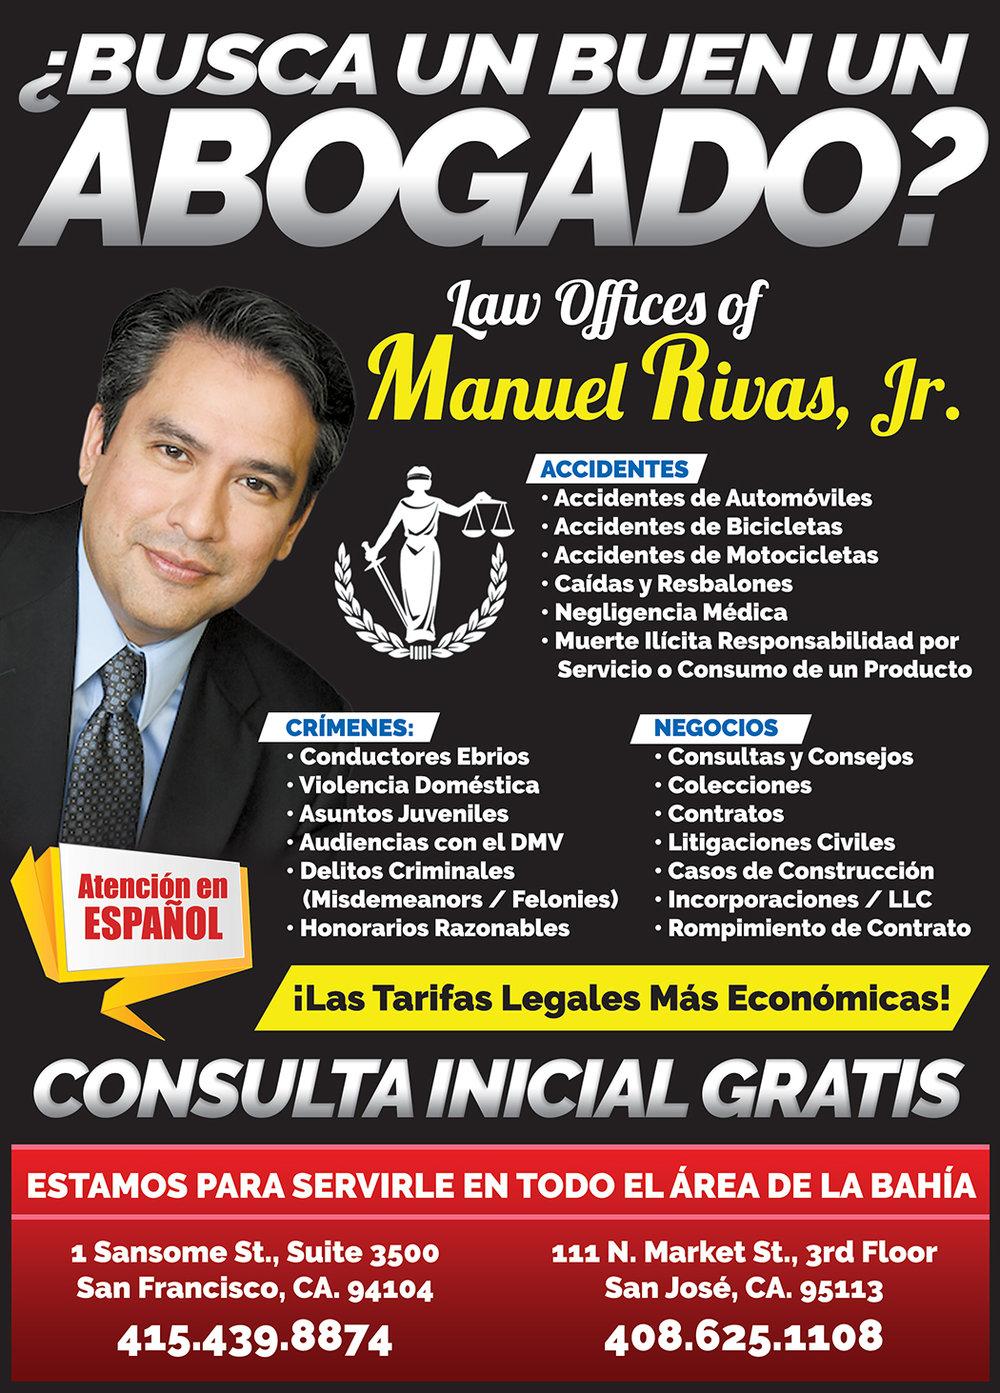 Manuel Rivas JR 1pag ABRI 2017.jpg